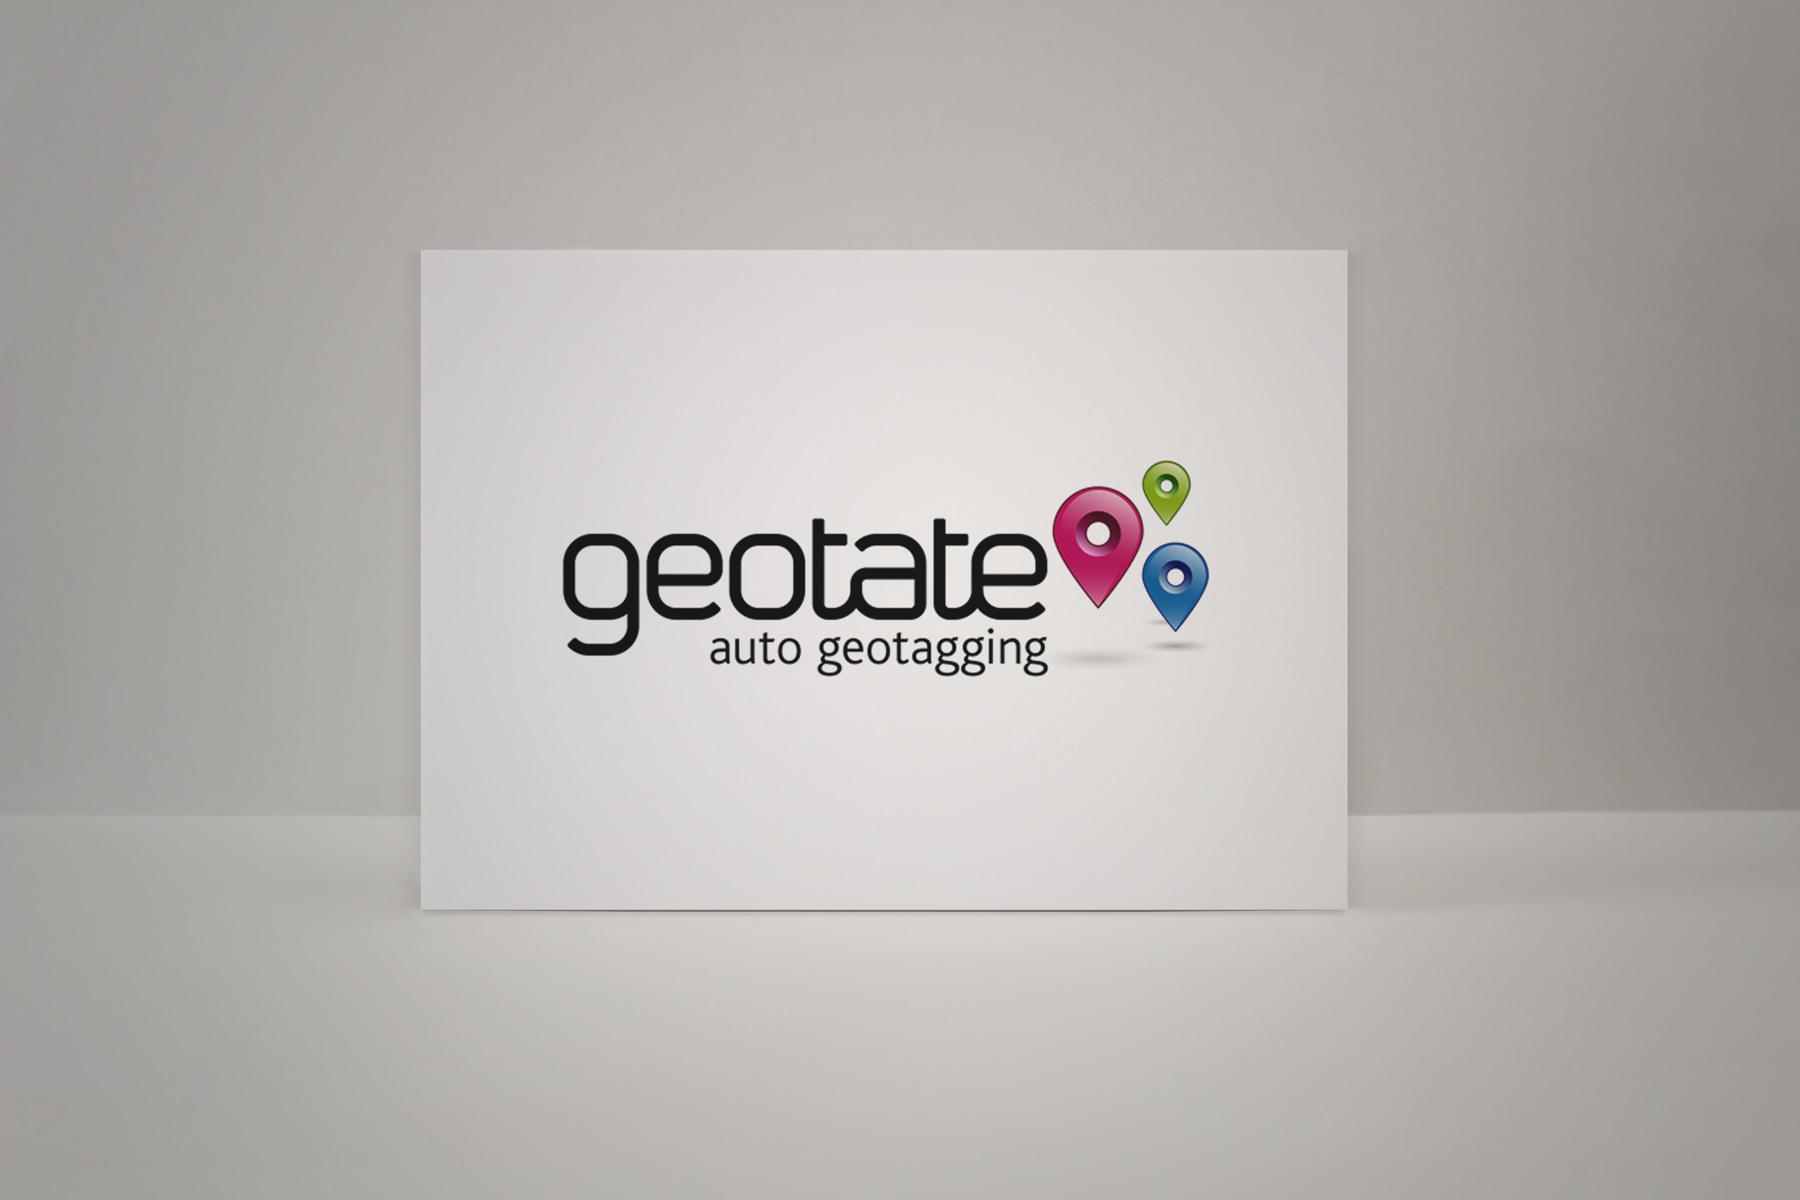 geotate_004